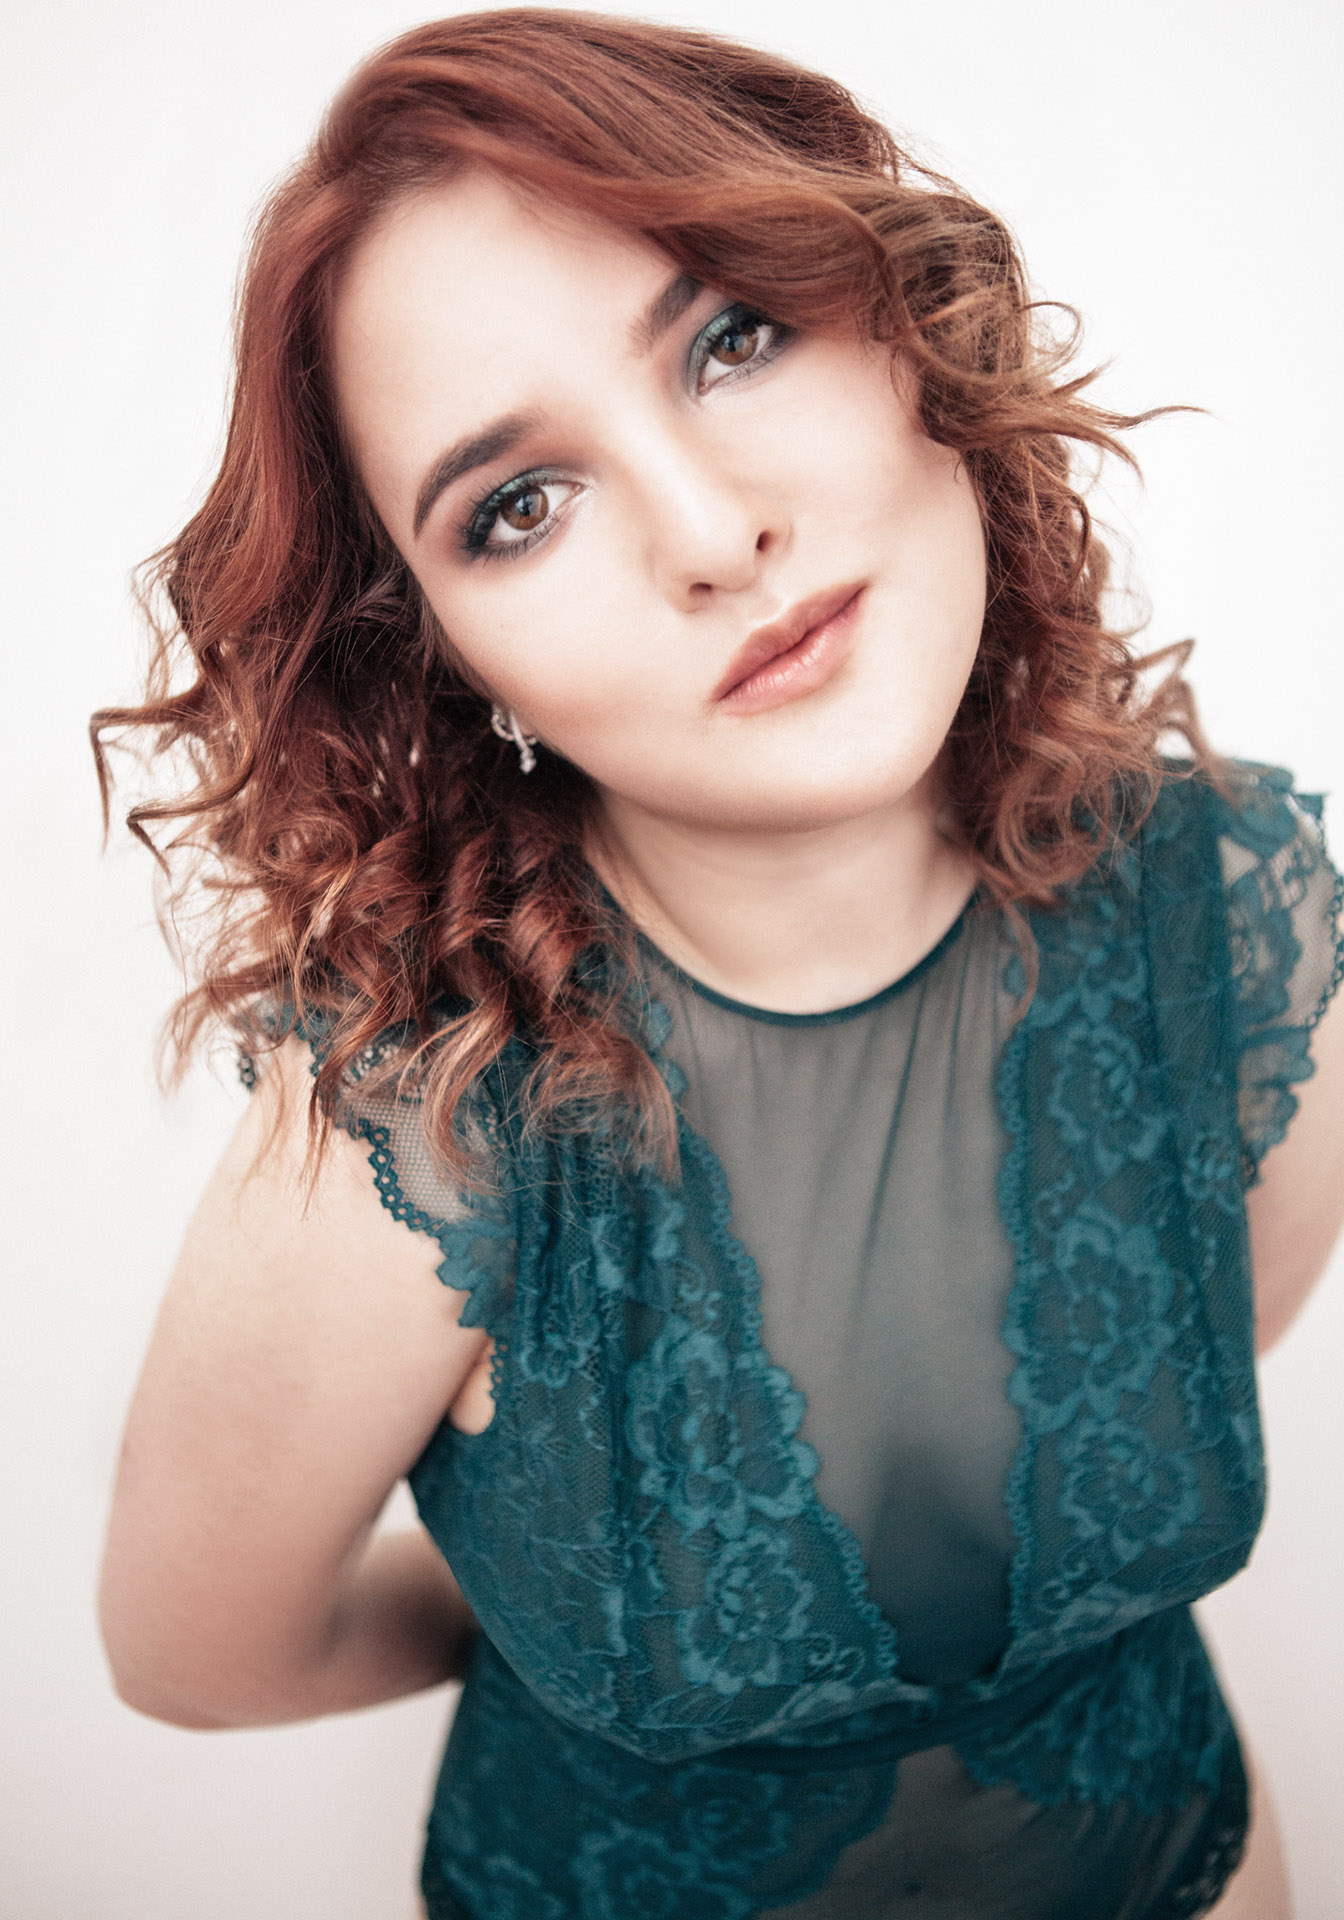 Portrait by photographer Vanessa Wozcniaki. Vanessa Woz Photography